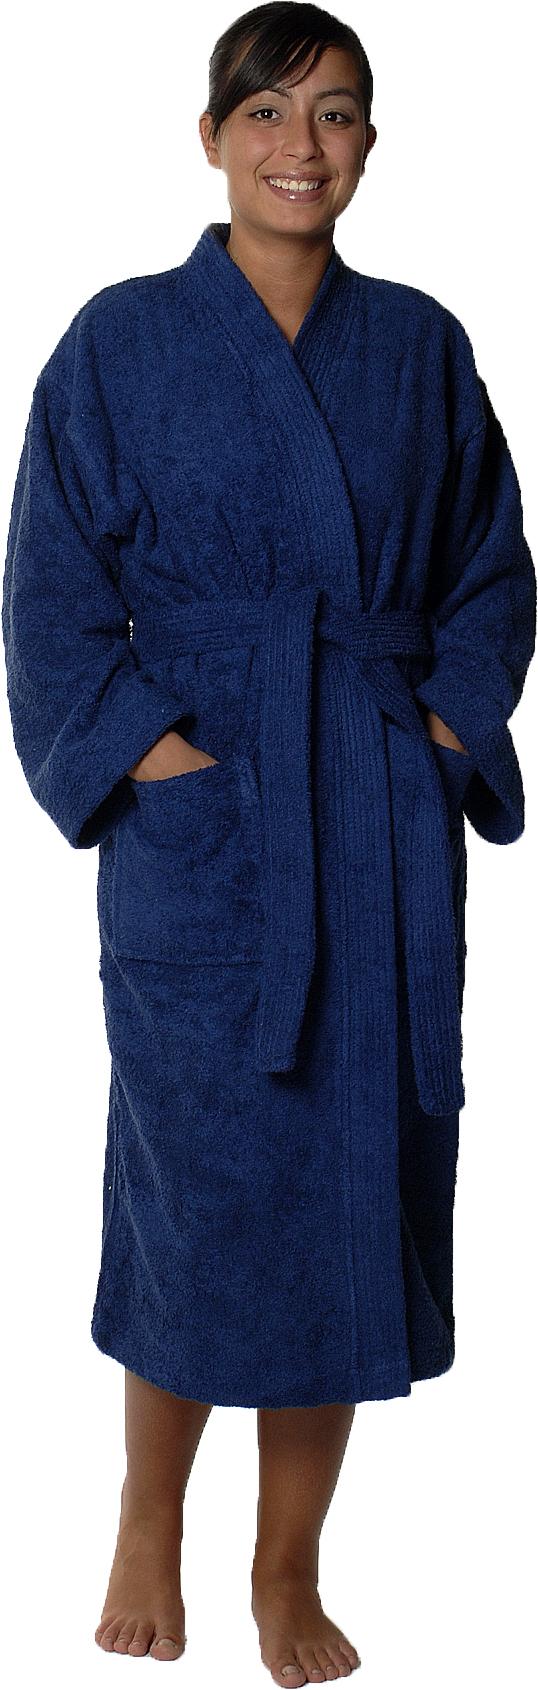 Peignoir col kimono en Coton couleur Marine Taille L (Marine)